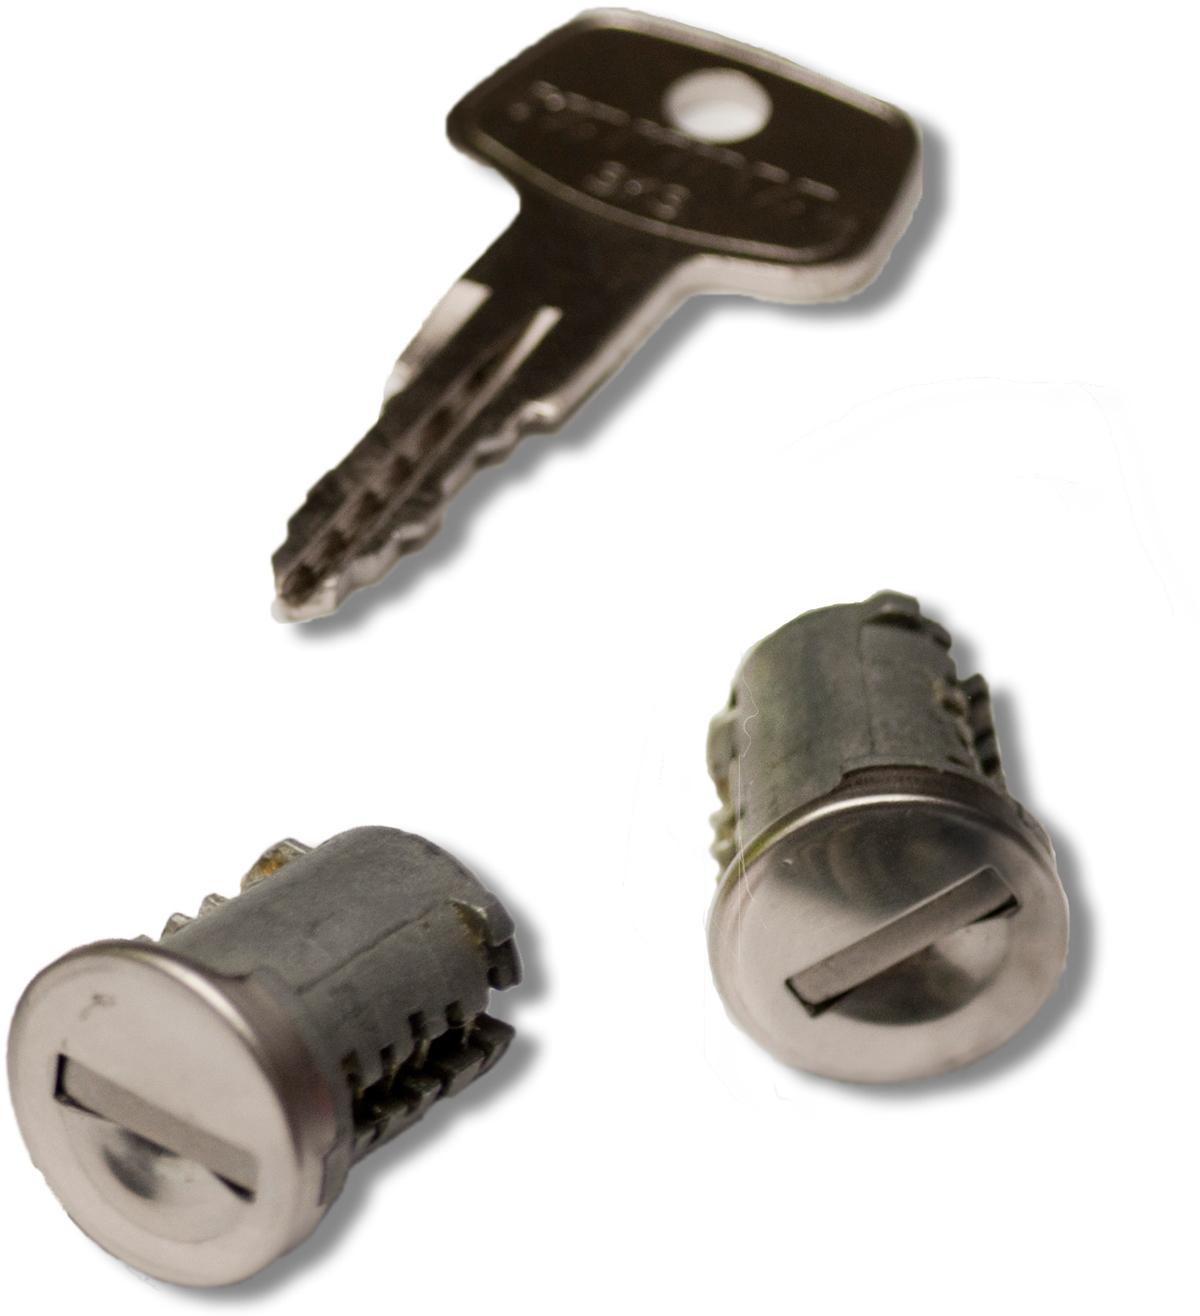 Yakima Sks Lock Cores 2 Pack Progression Cycle